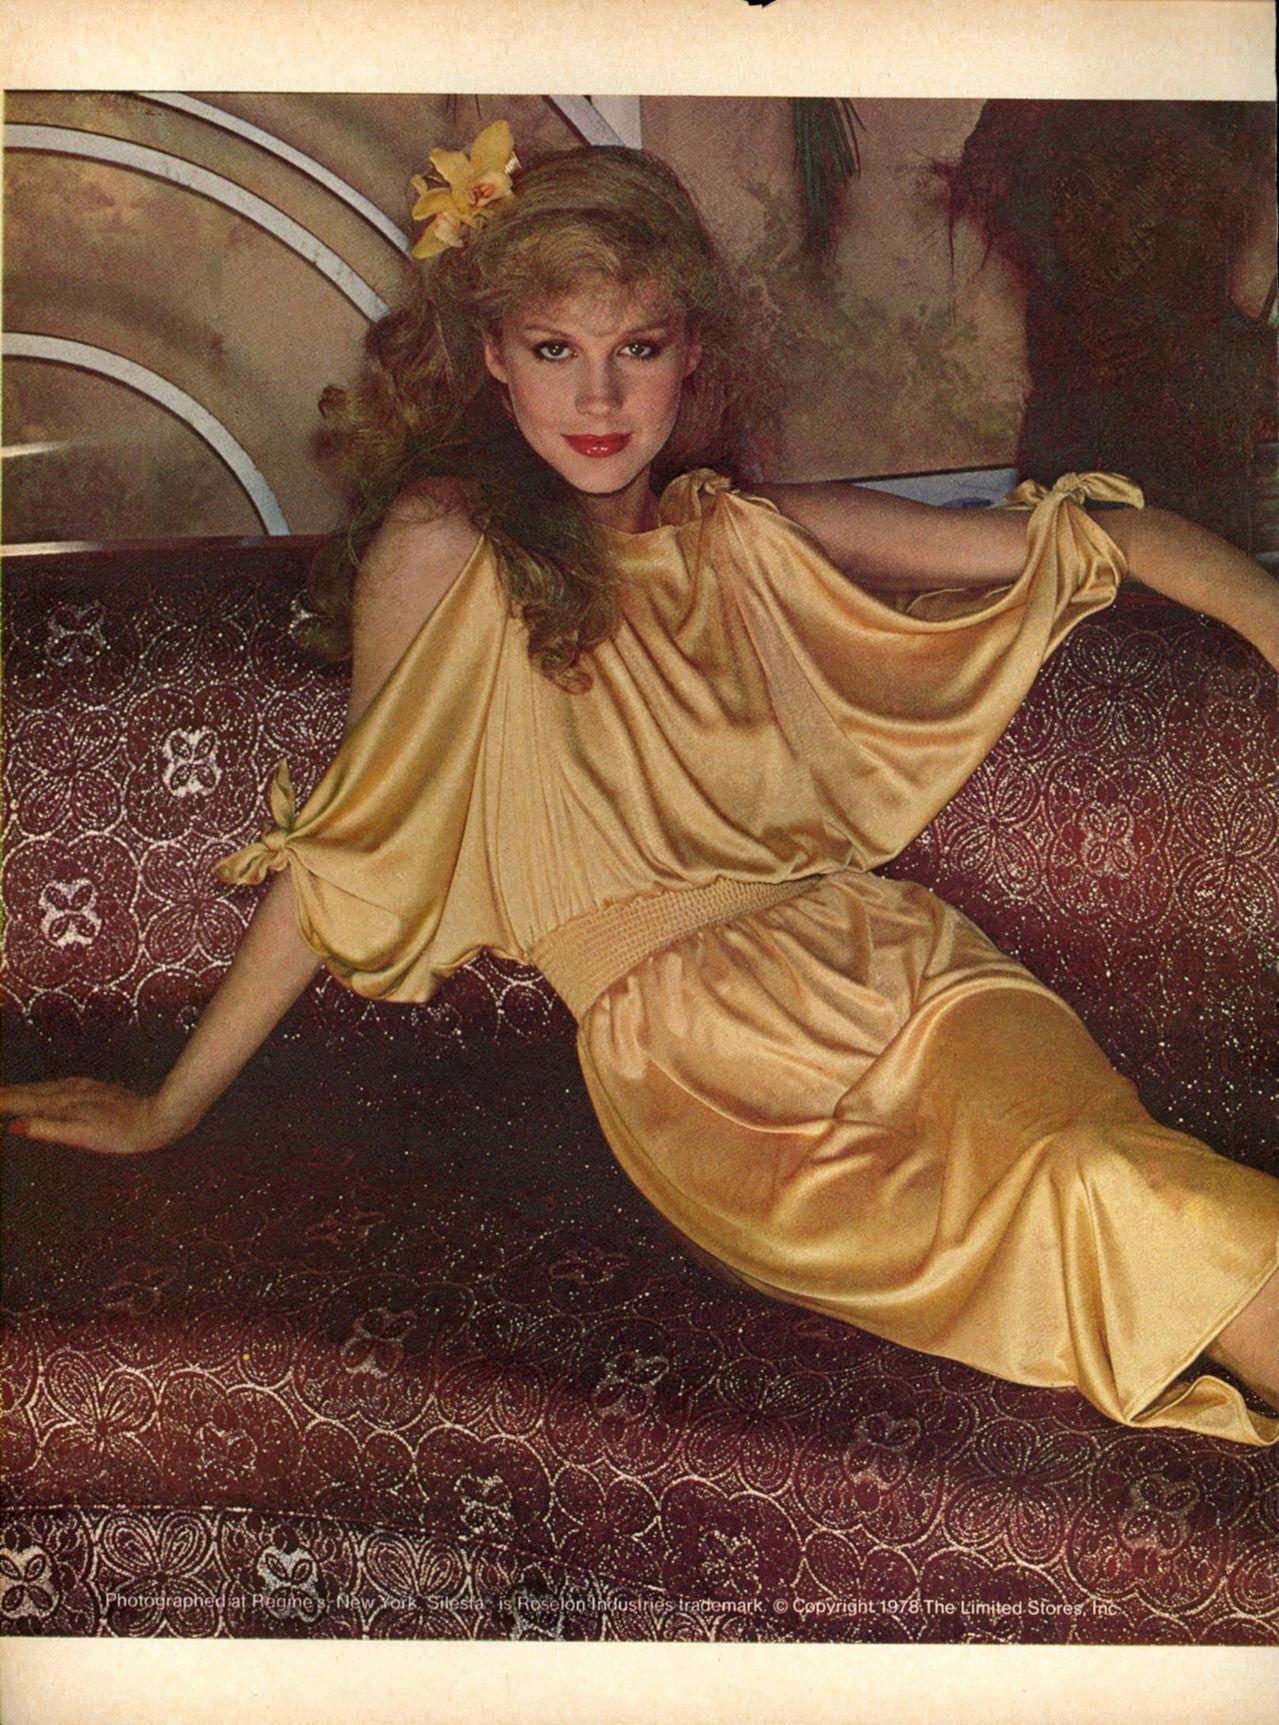 1978 The Limited Rosie Vela Regine S New York Print Ad Advertisement Vintage